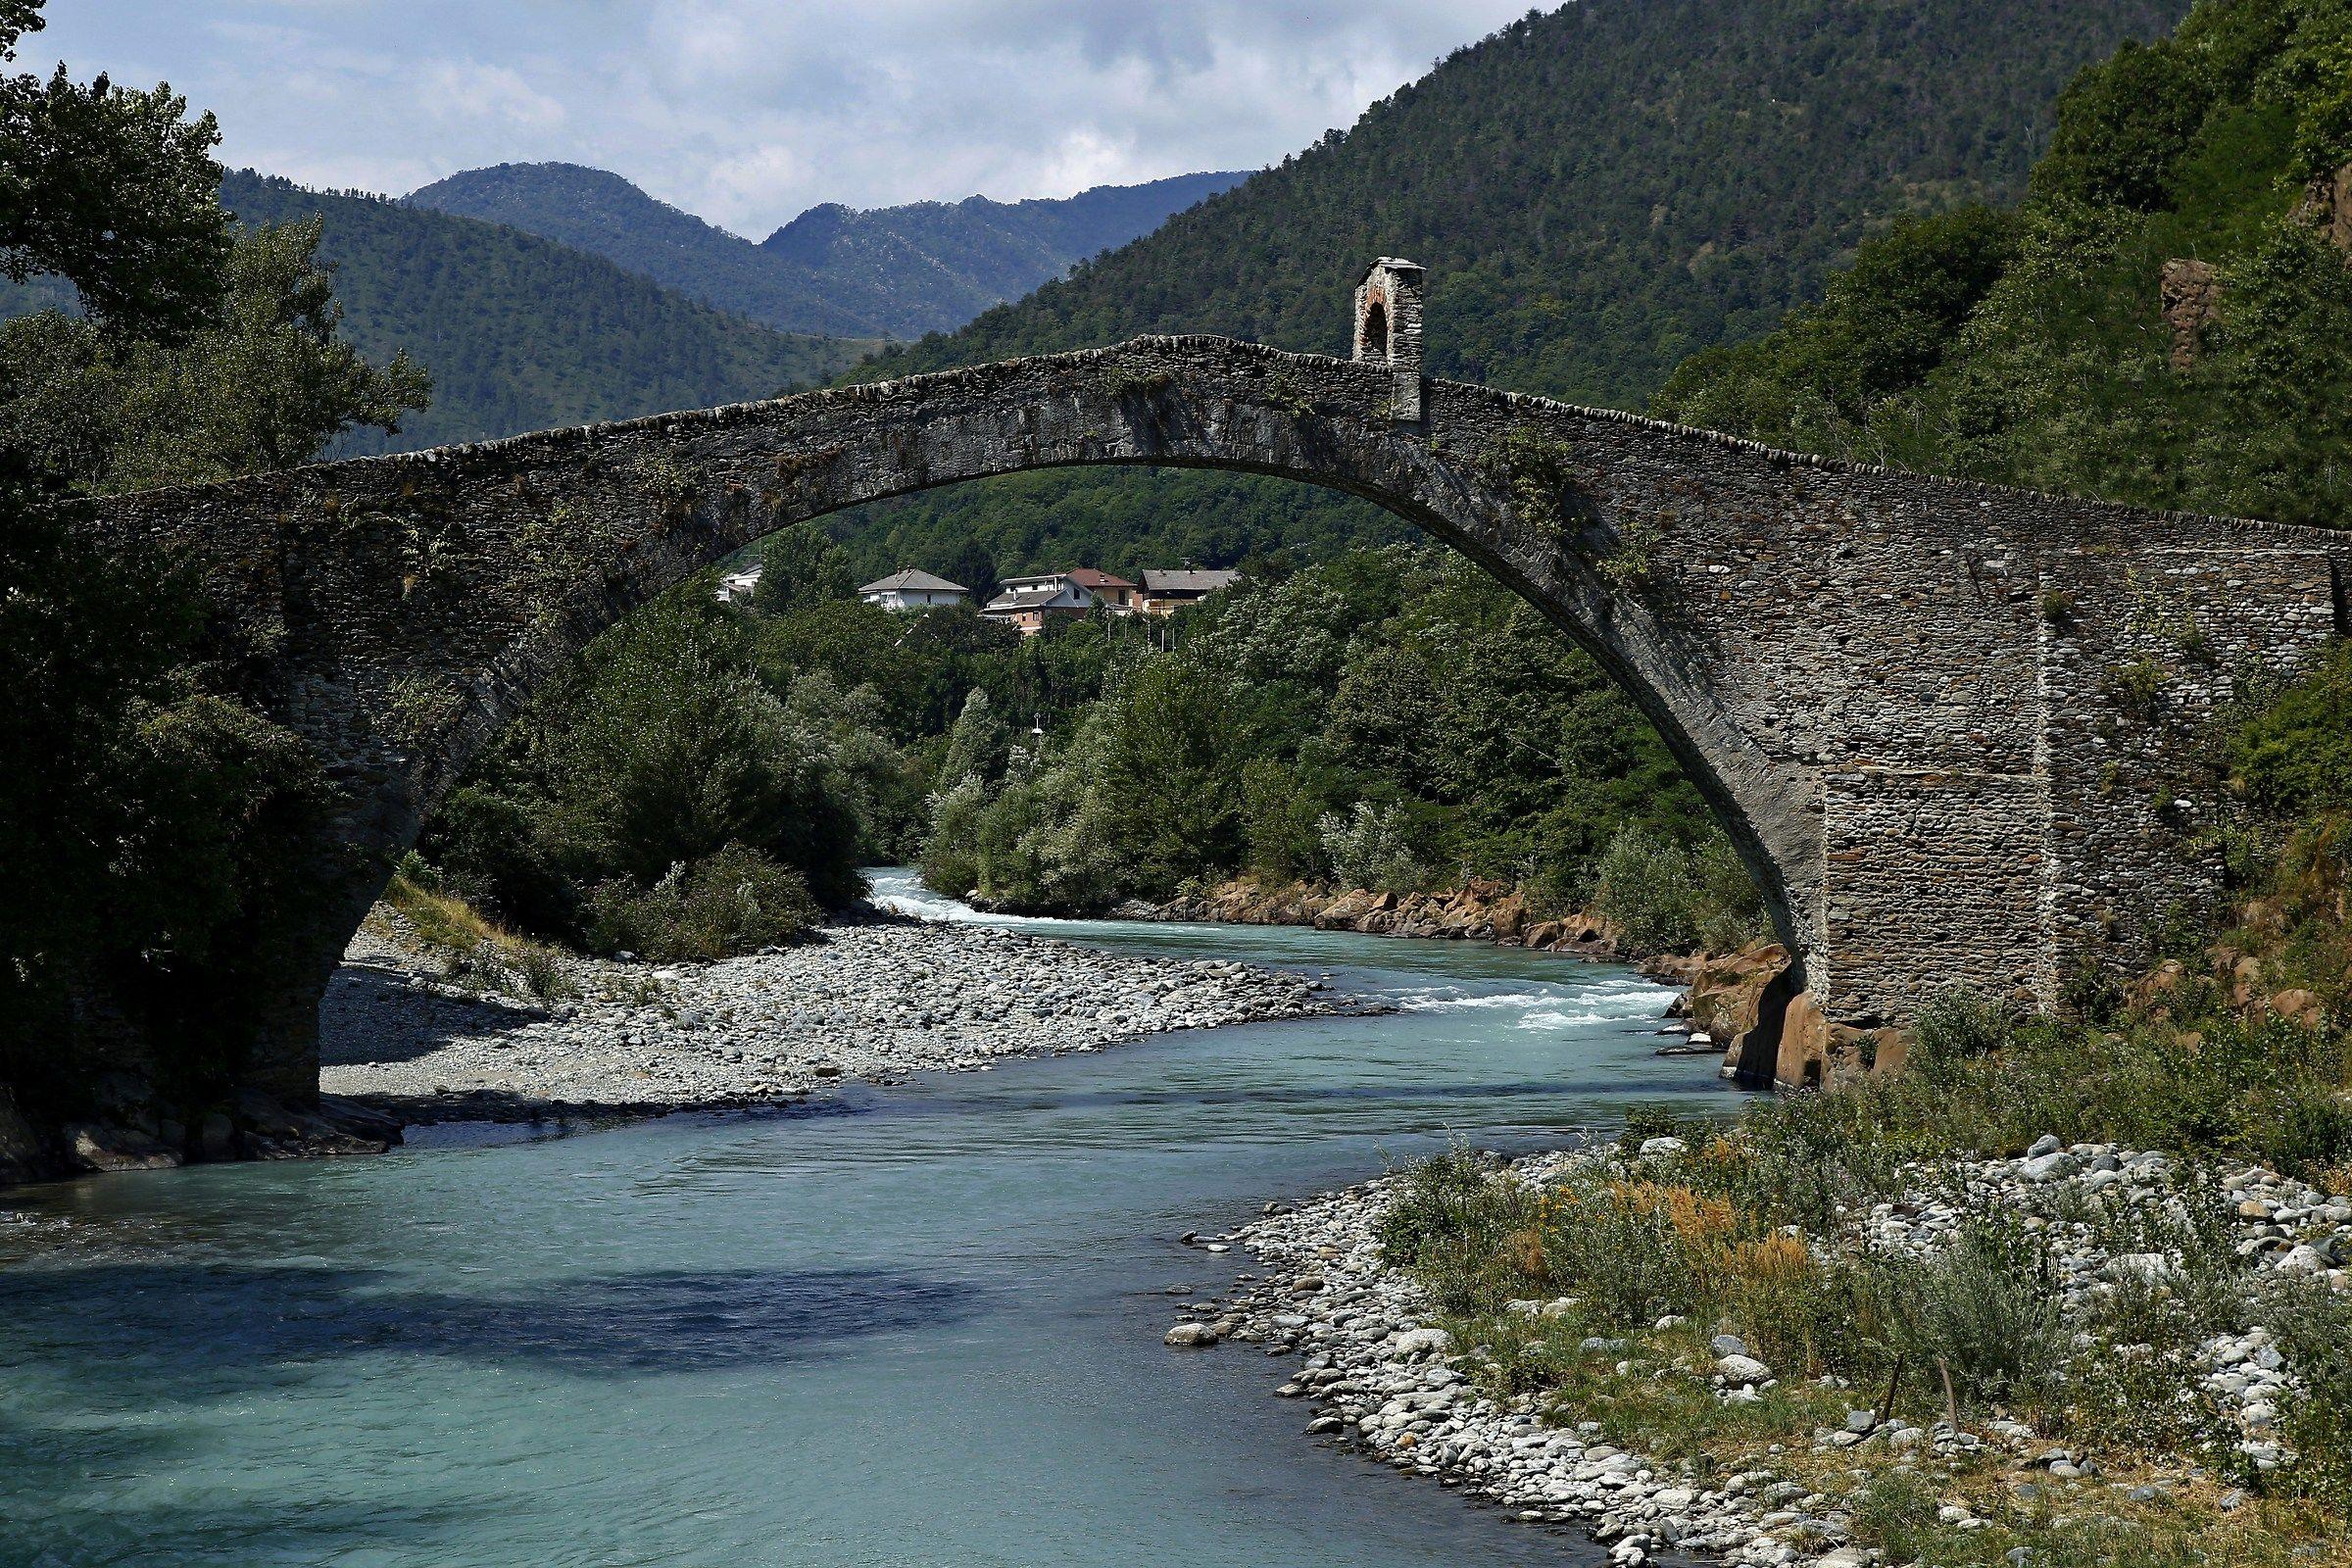 Bridge of the Devil 2...